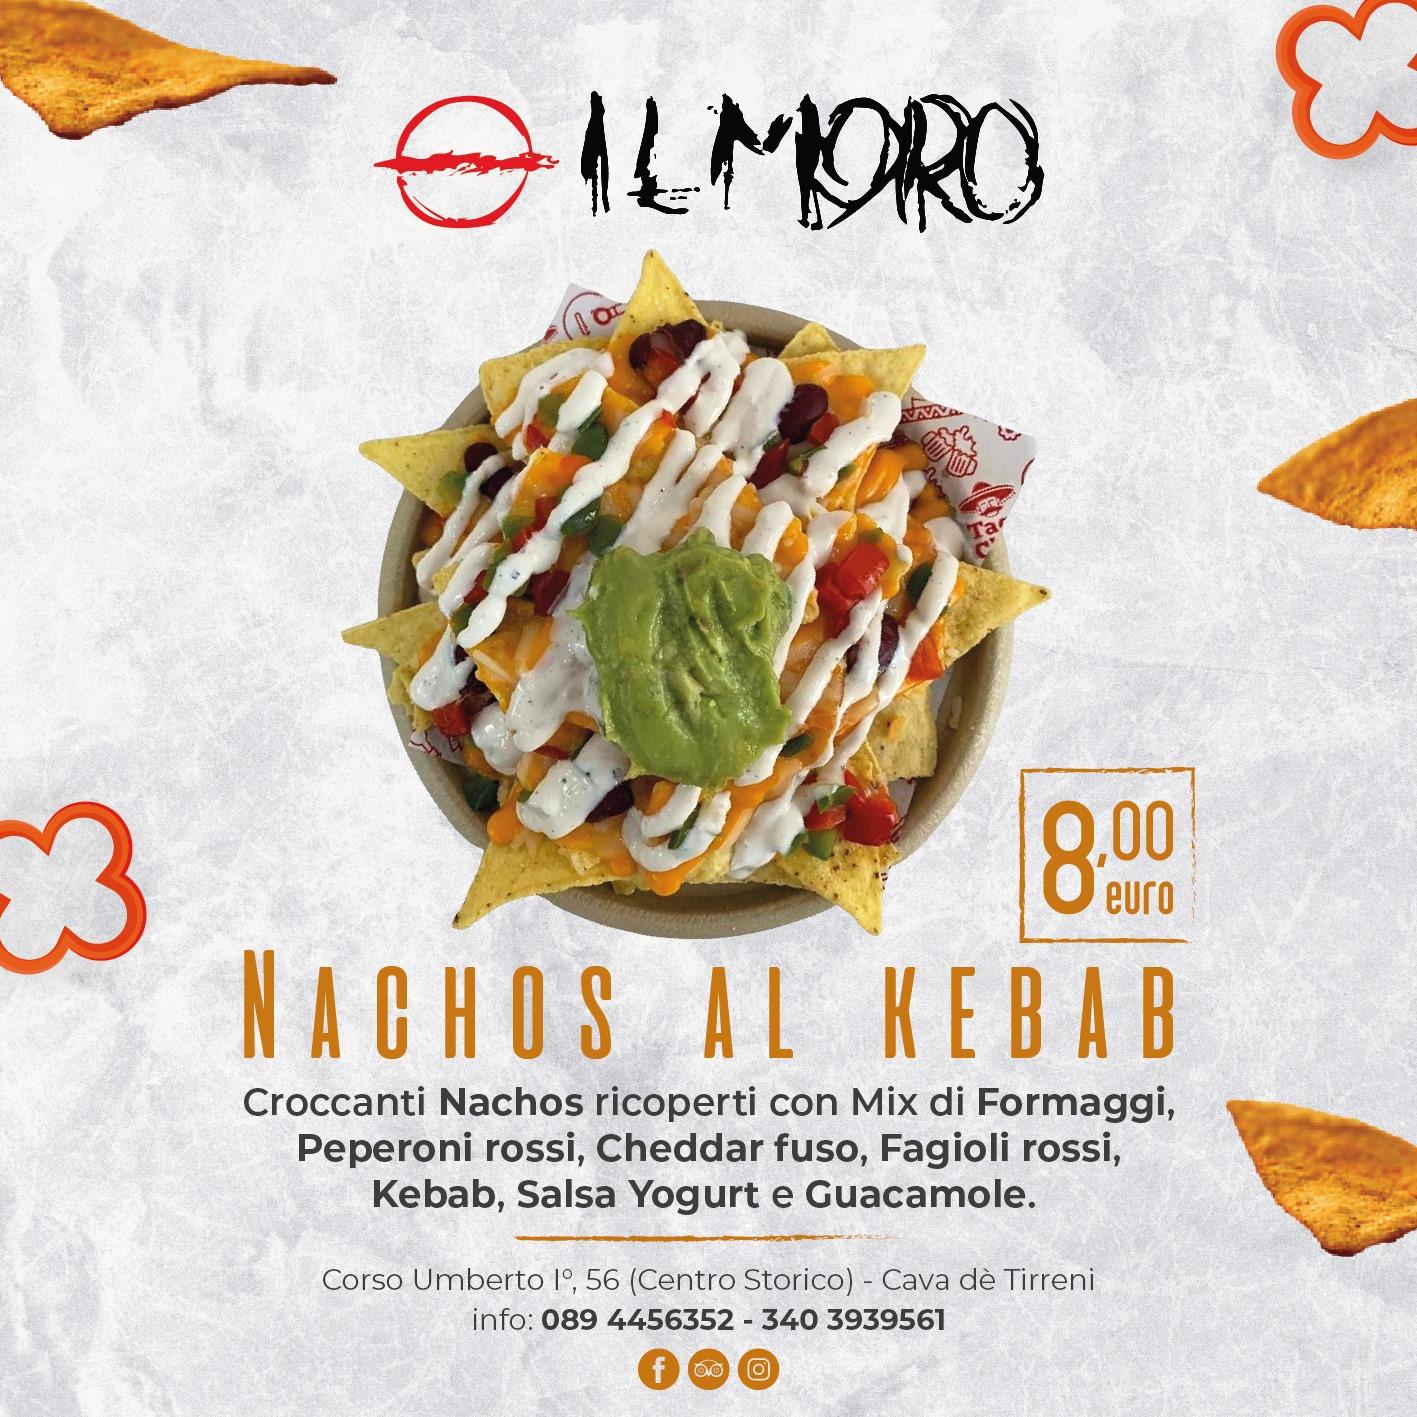 Scopri i Nachos al Kebab del Pub Il Moro!